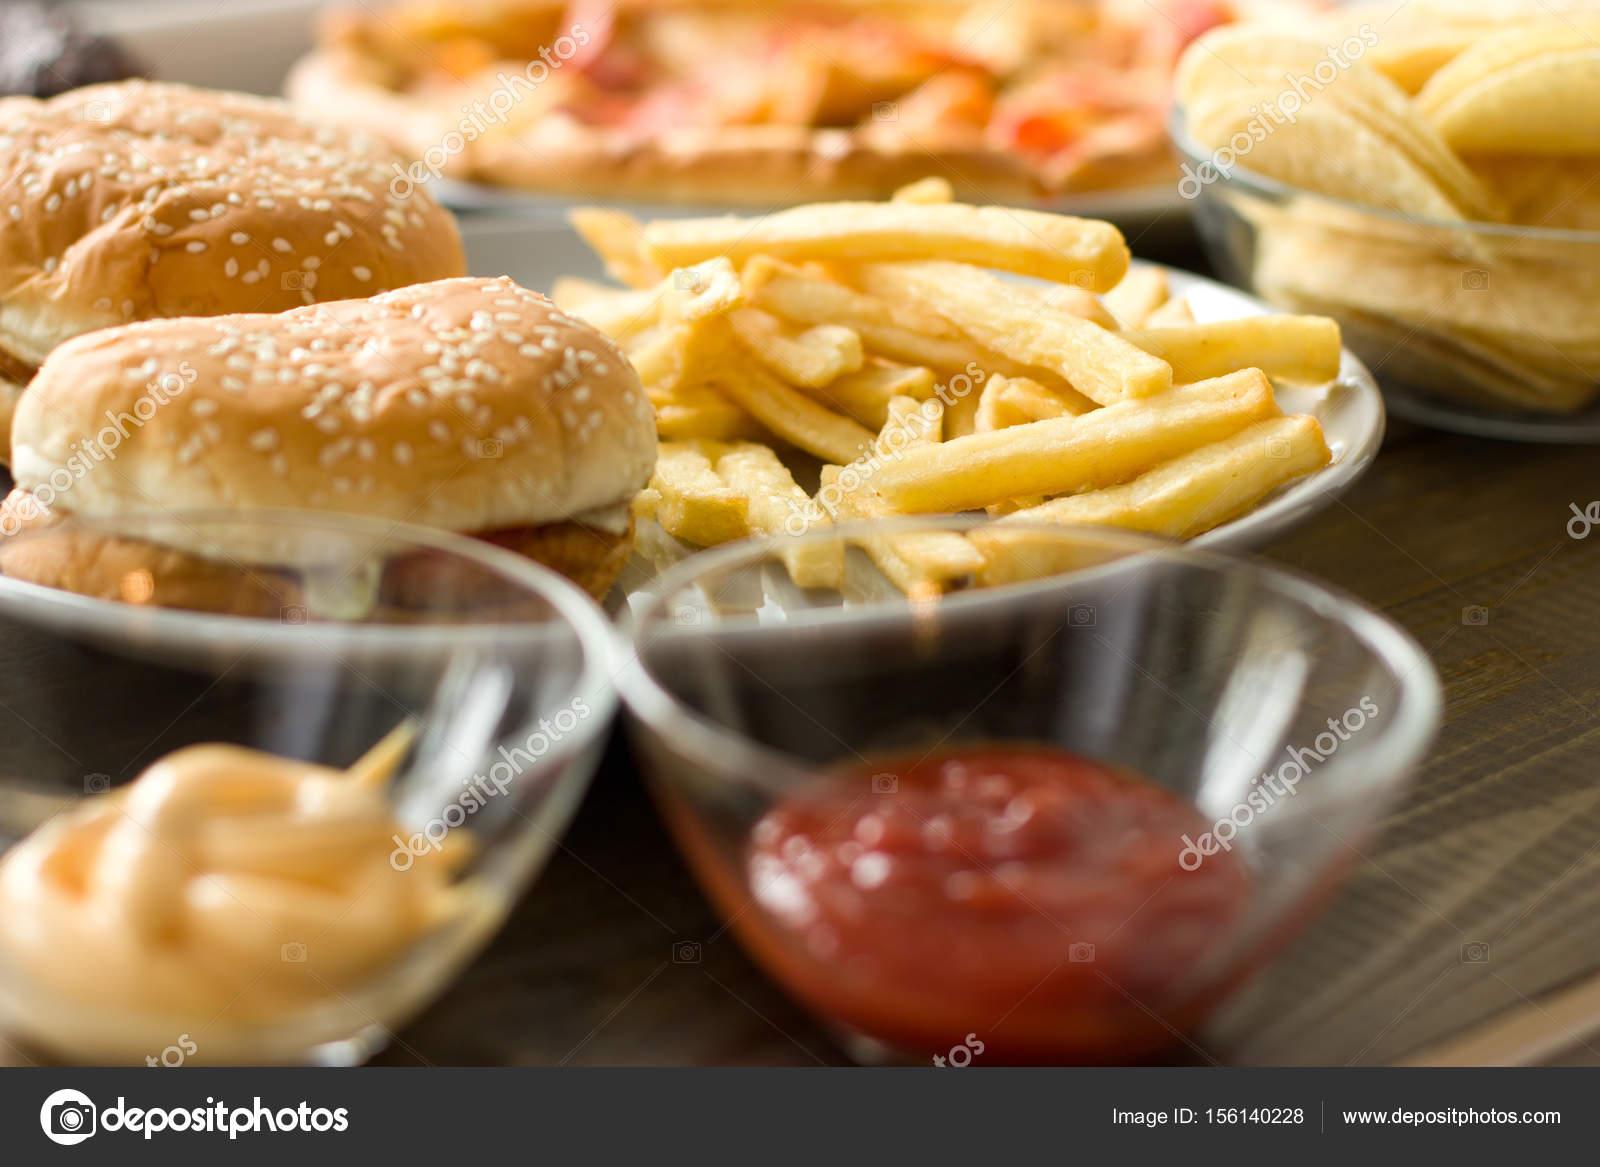 Unhealthy concept  unhealthy food: Burger, sauce, potatoes, donu